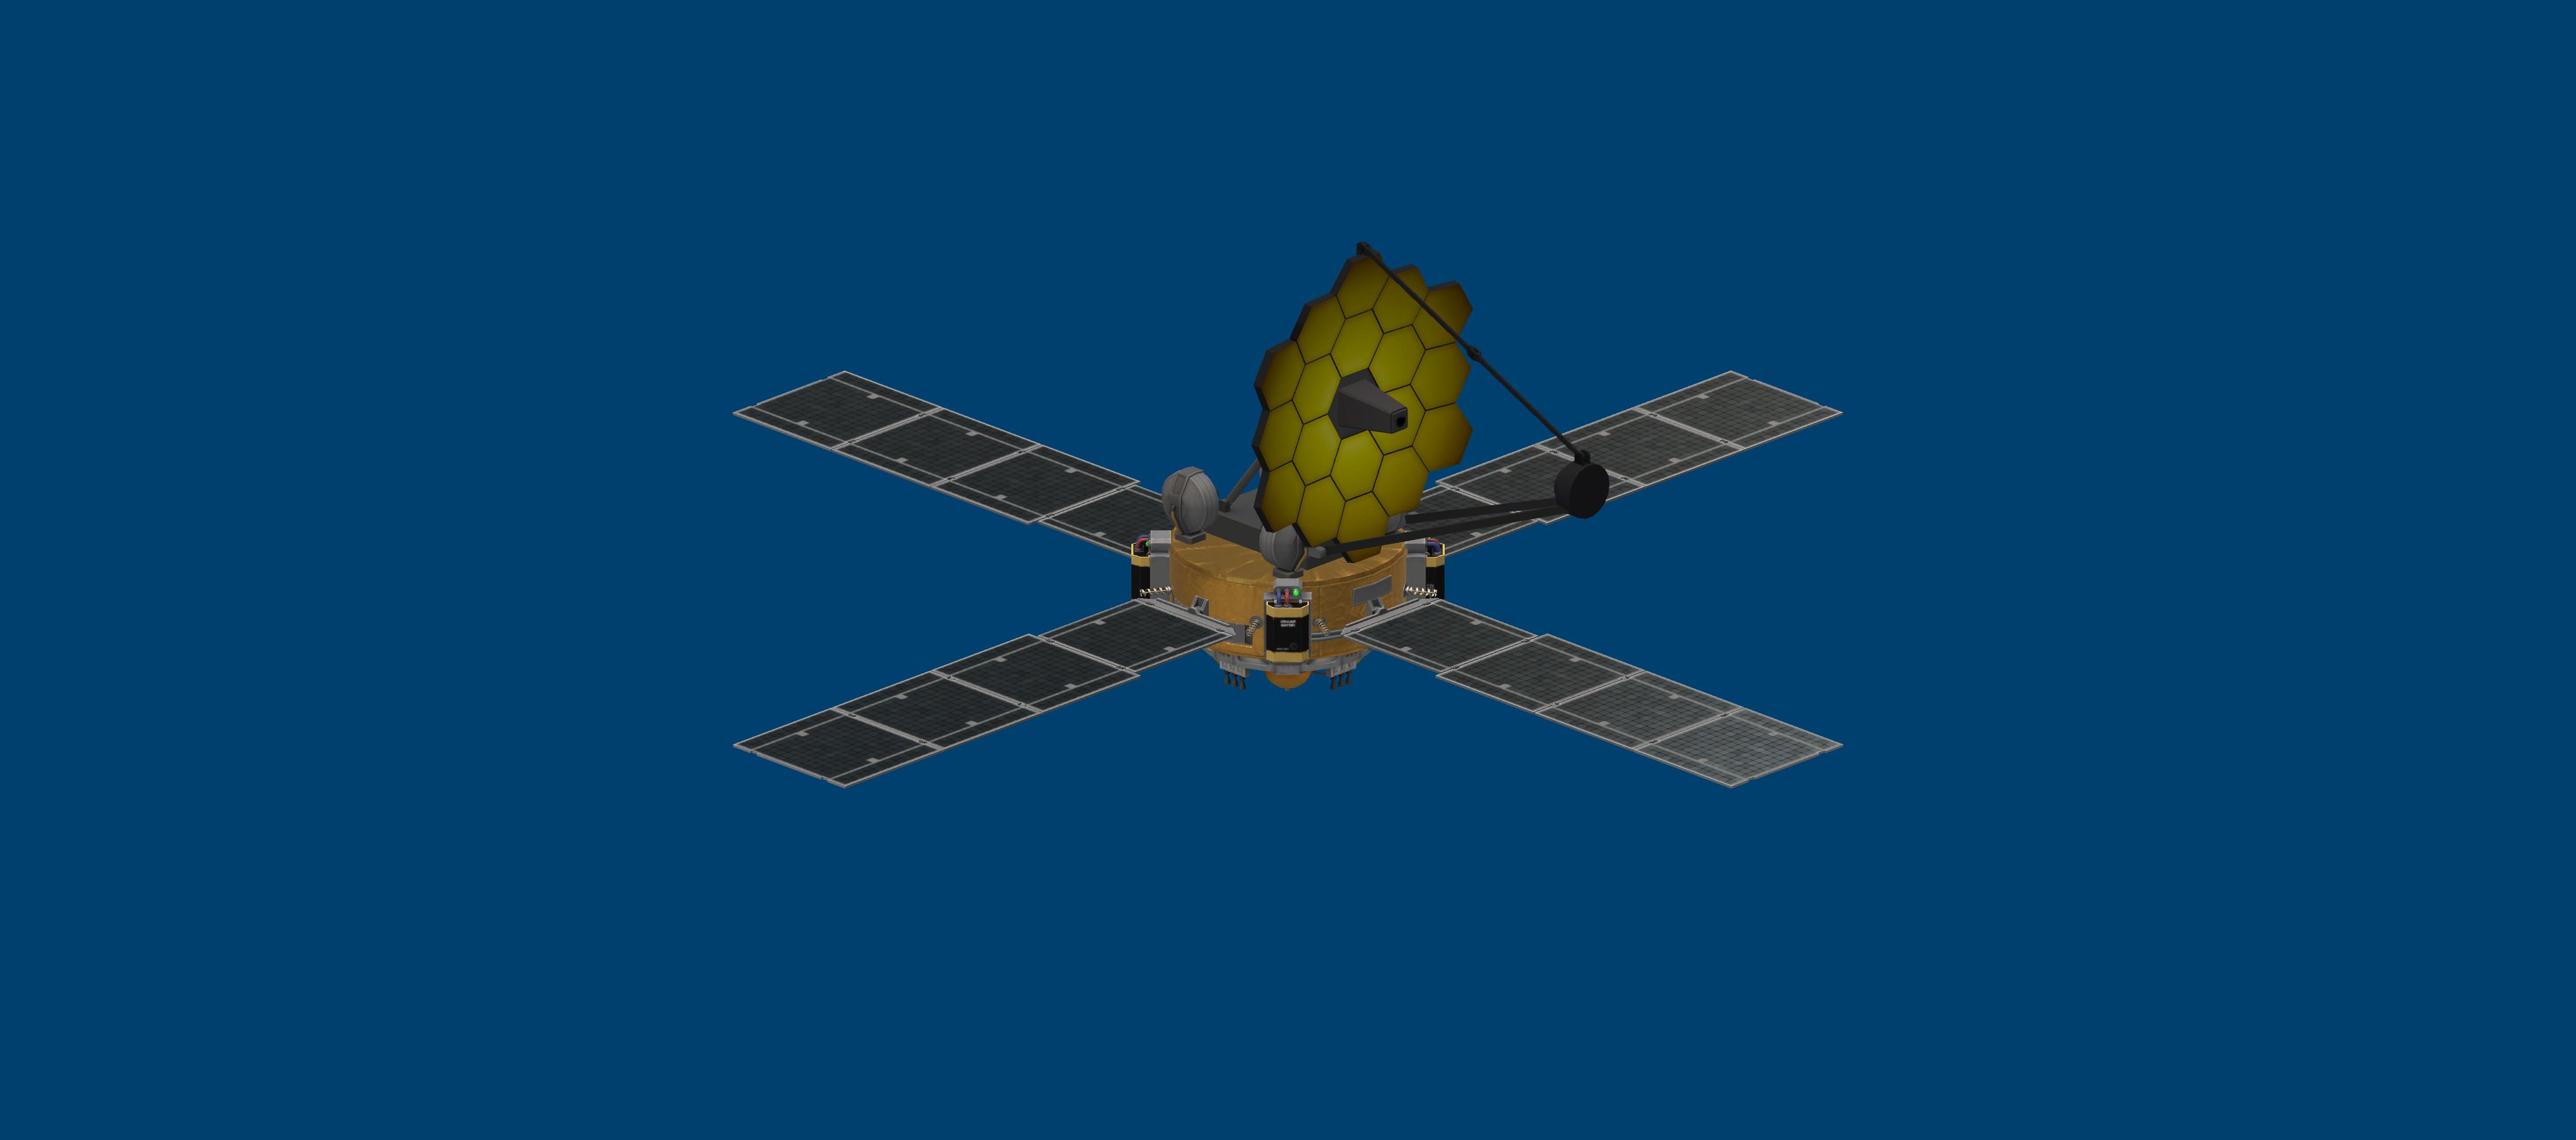 Jodrin-Kerman-Space-Telescope-KVV.png